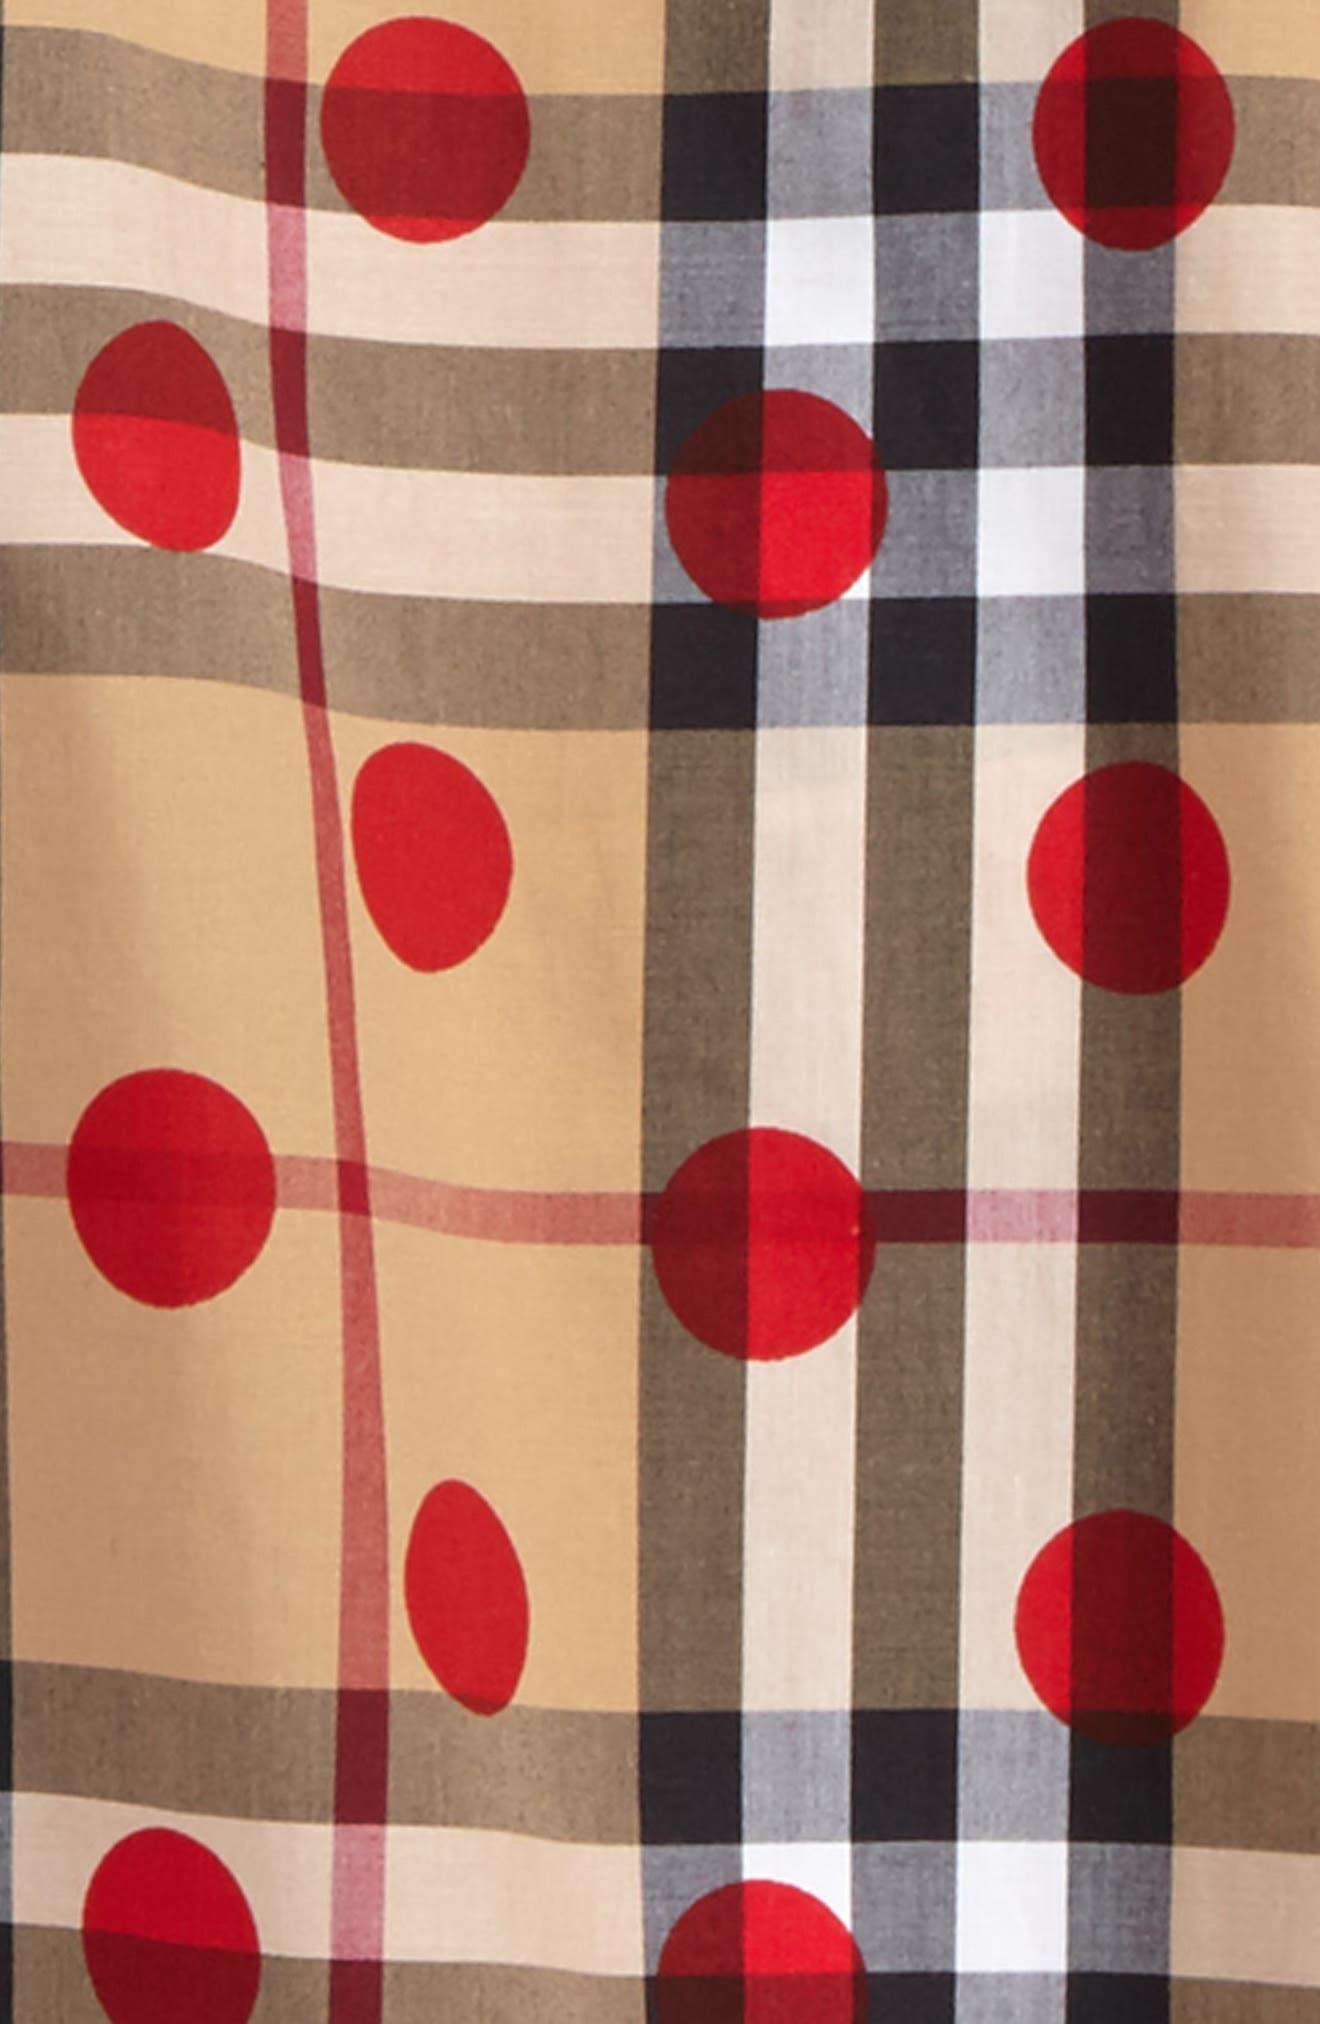 Haleena Polka Dot & Check Print Top,                             Alternate thumbnail 3, color,                             604